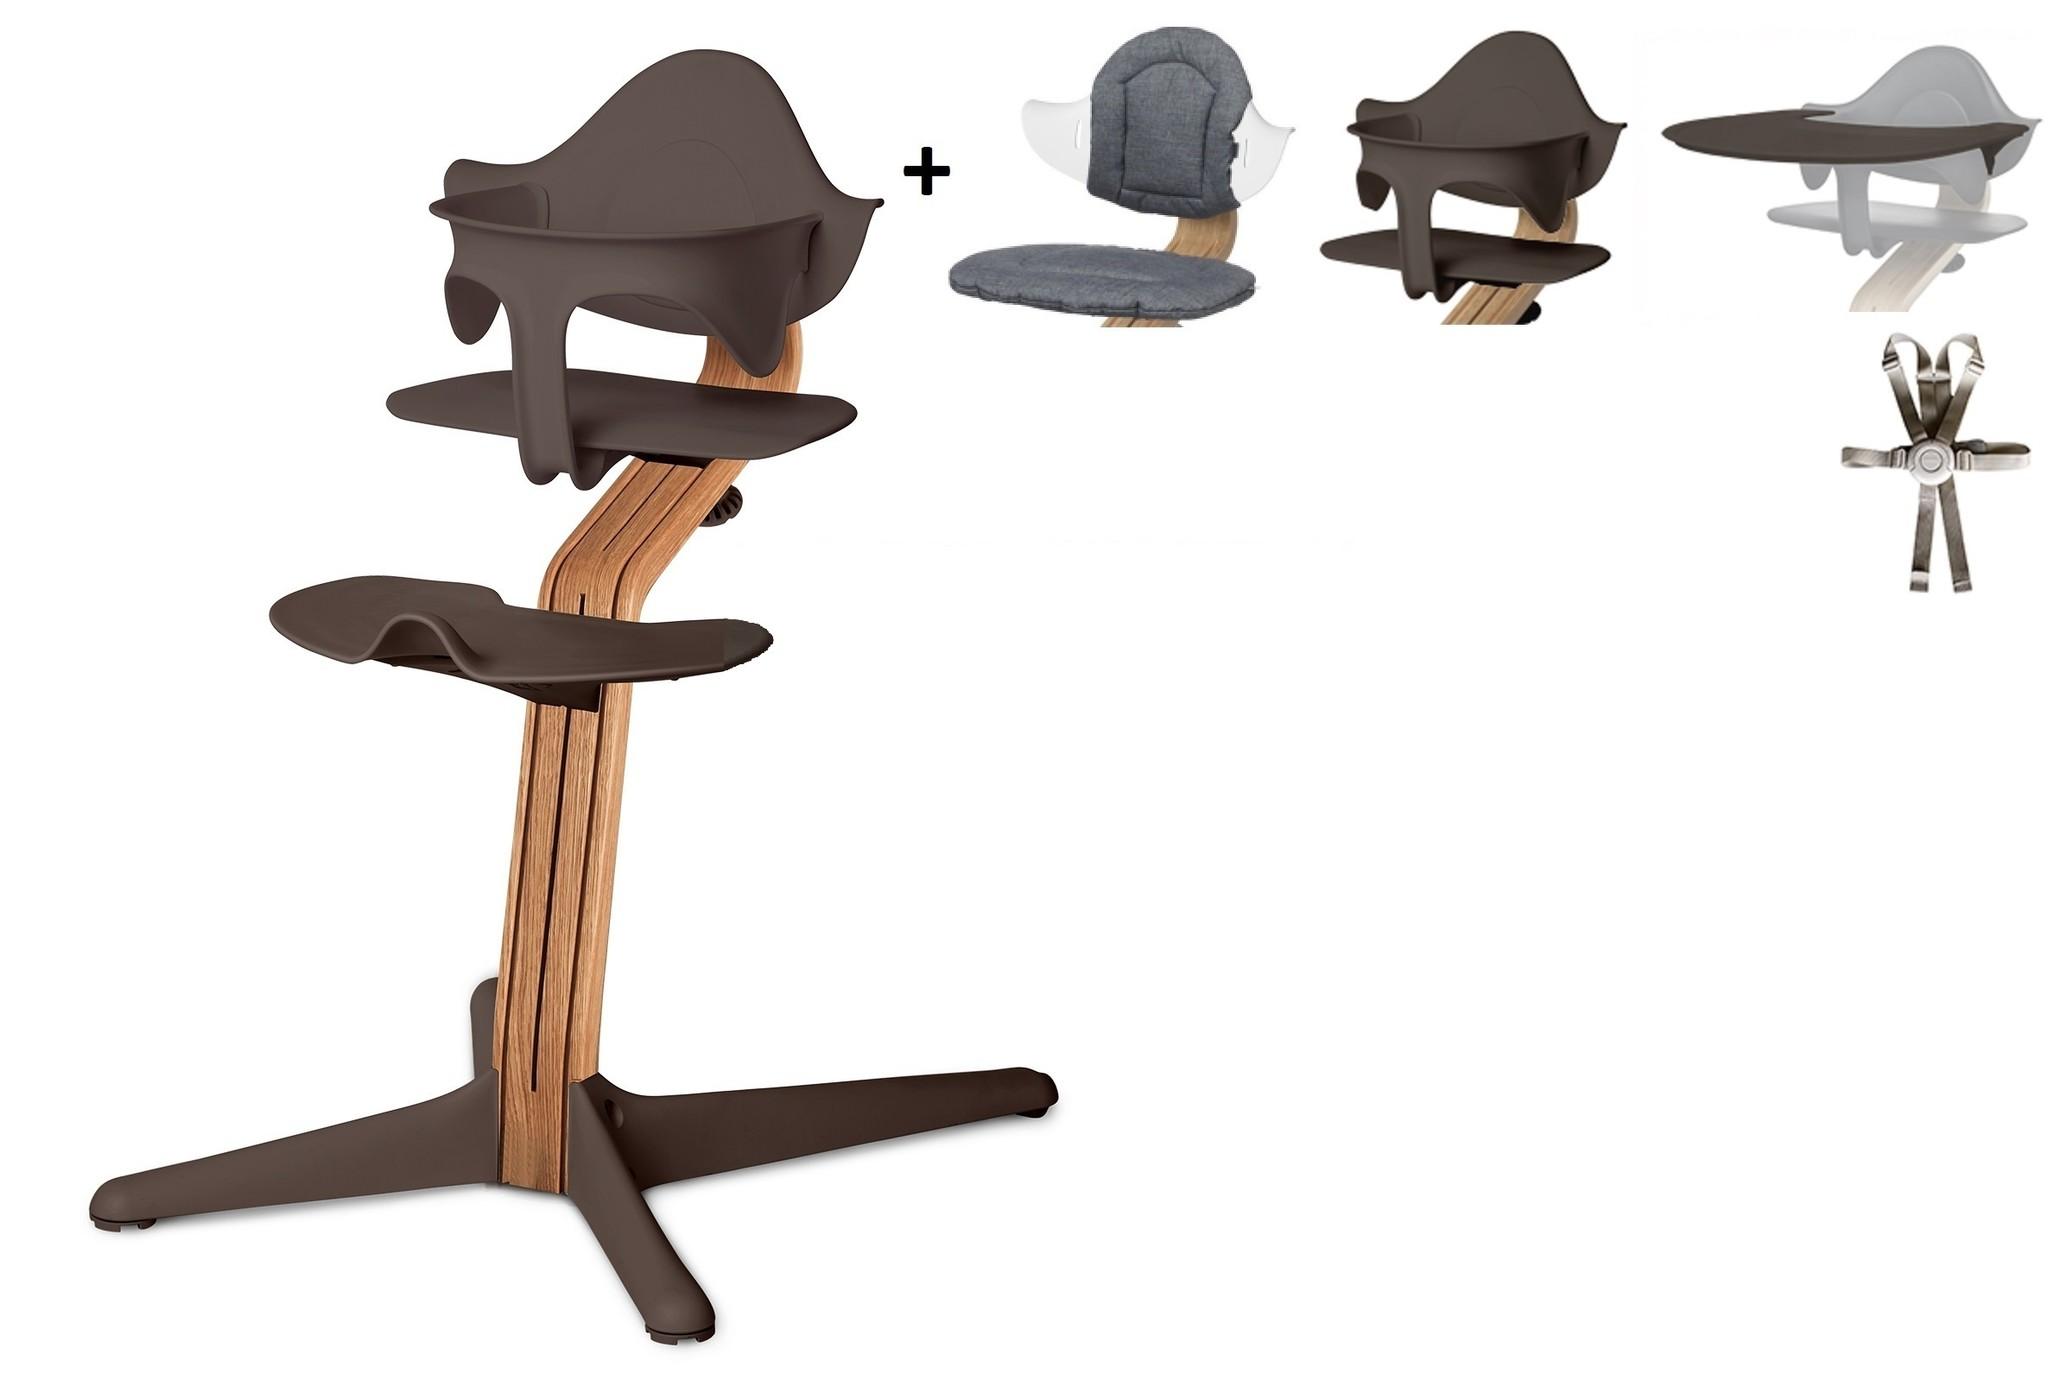 NOMI highchair Ideale set vanaf 6 maanden Basis eiken nature oiled en stoel coffee